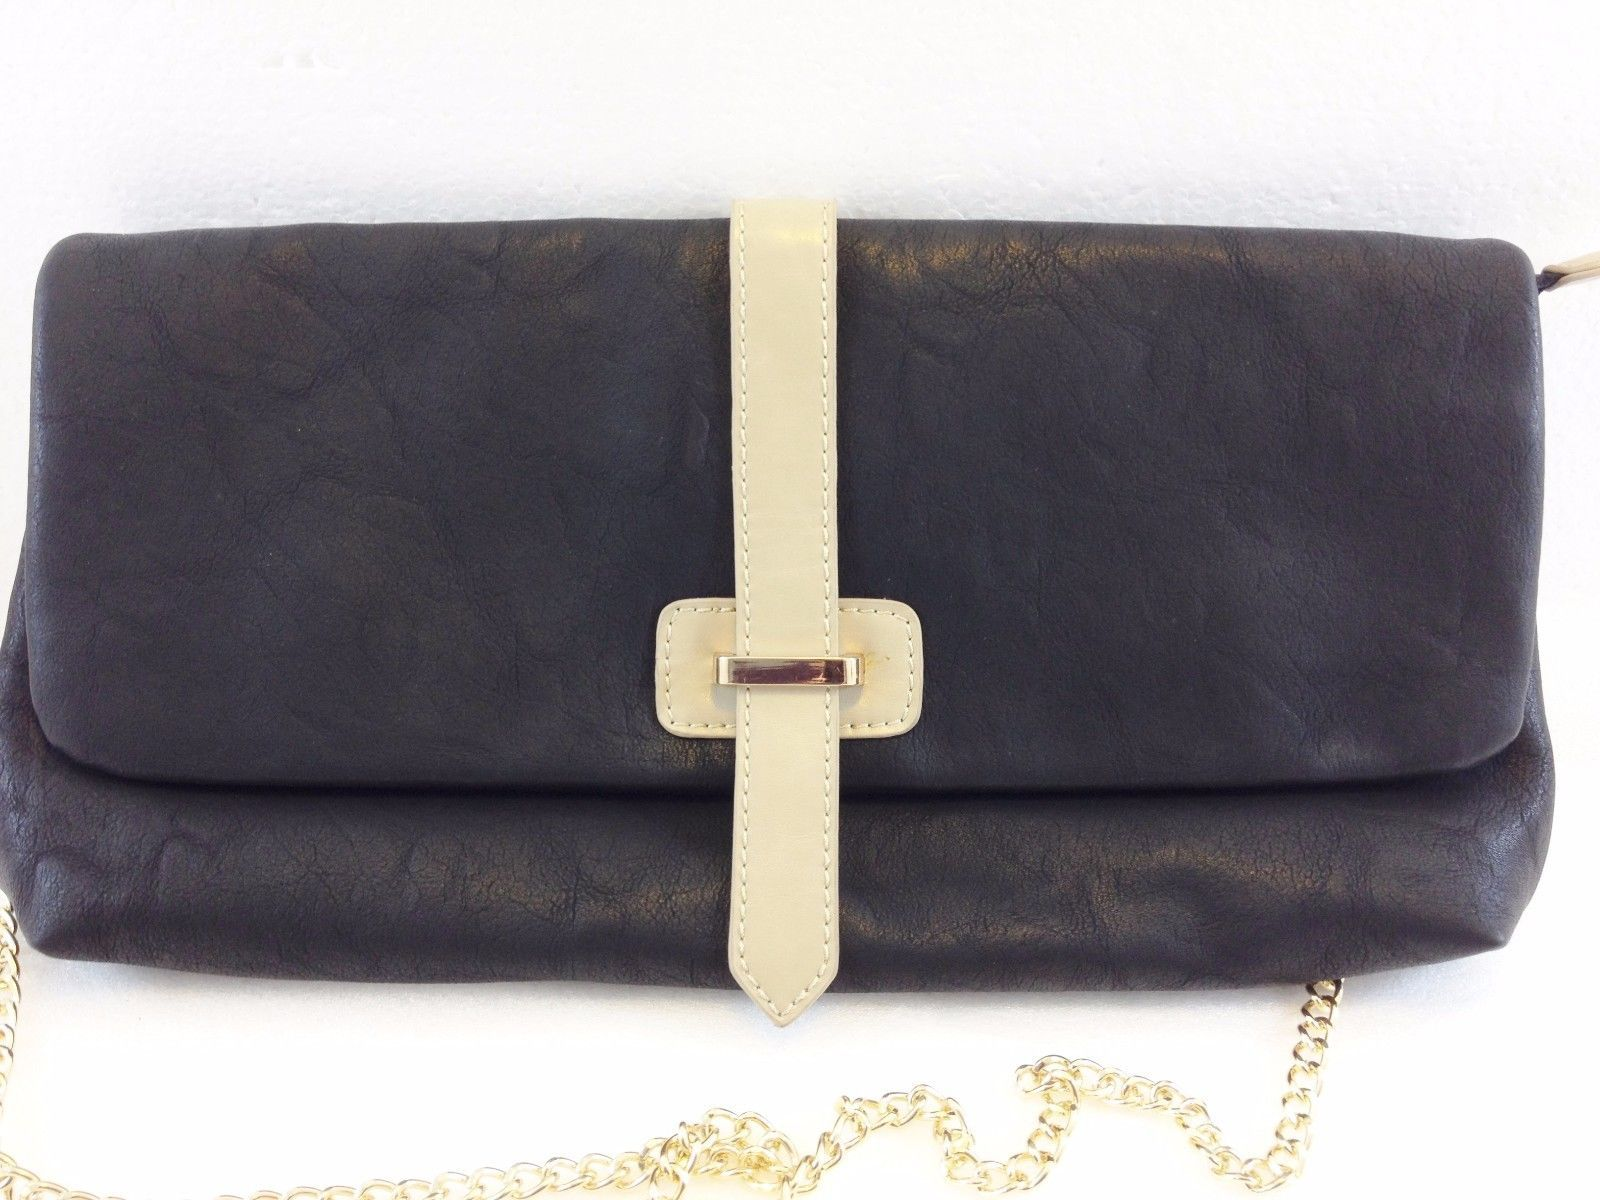 Shiraleah Chicago Black Vegan Leather Clutch Envelope Handbag NEW Optional  Strap -  40.40 46cce181b5